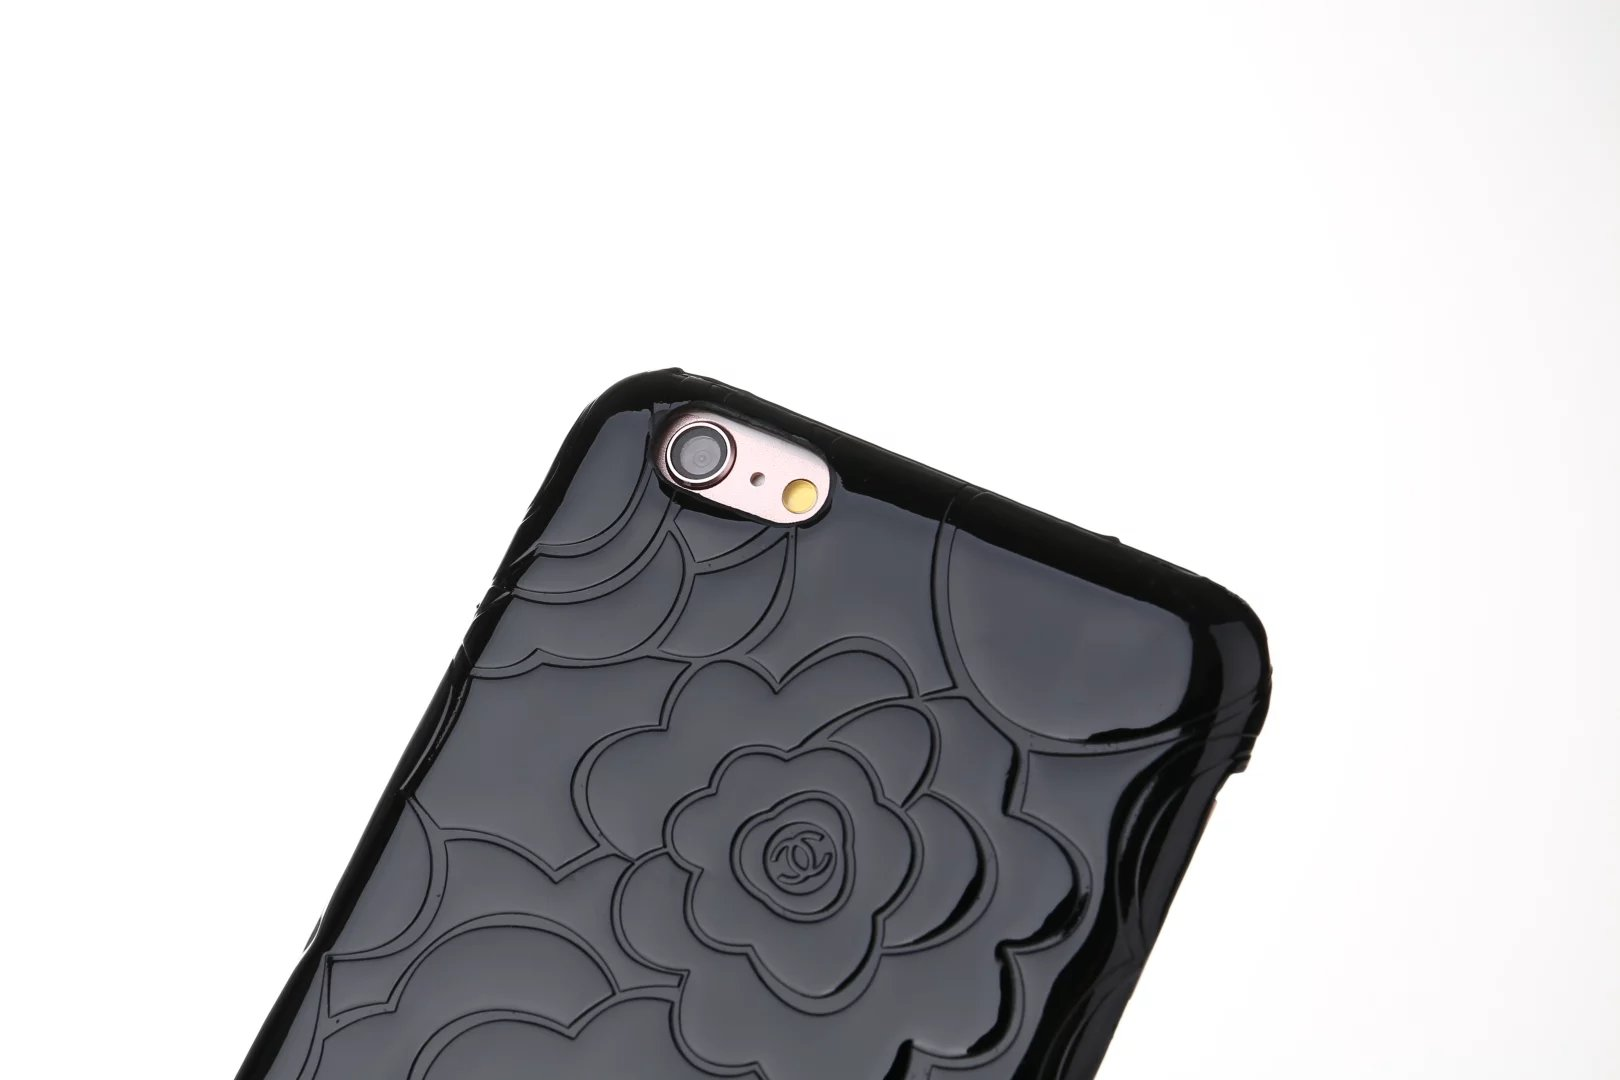 where to find iphone 7 Plus cases top iphone 7 Plus cases fashion iphone7 Plus case case cover for iphone 7 Plus design iphone 7 Plus case case iphone 7 Plus c designer iphone flip case case 7 Plus iphone iphone 7 Plus original cover